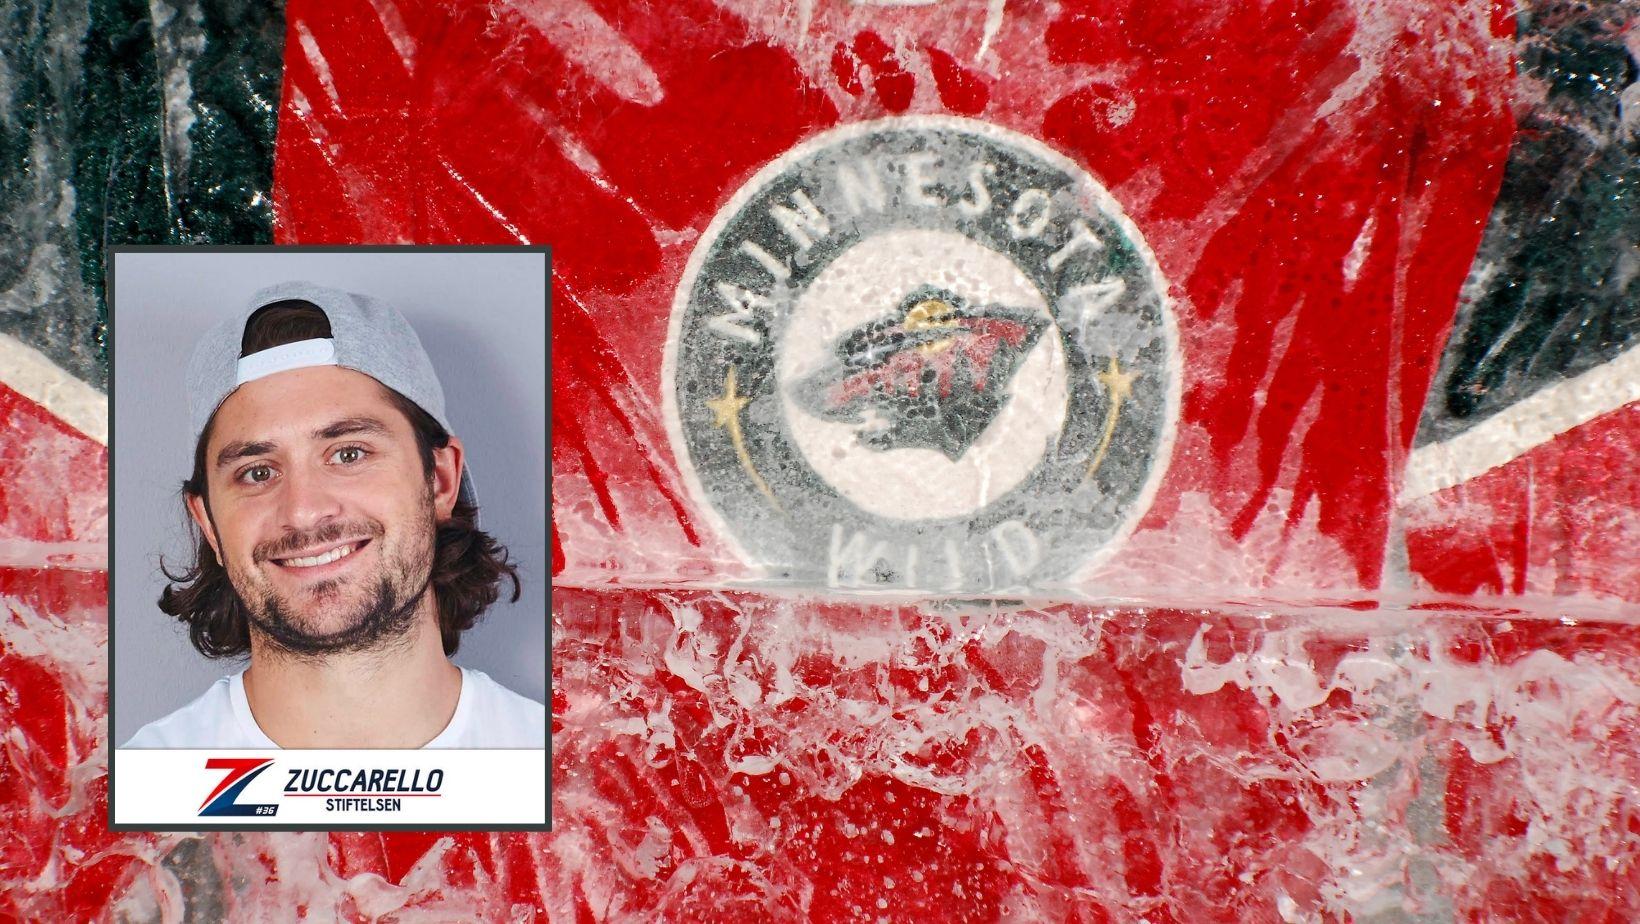 Mats Zuccarello in Minnesota Wild